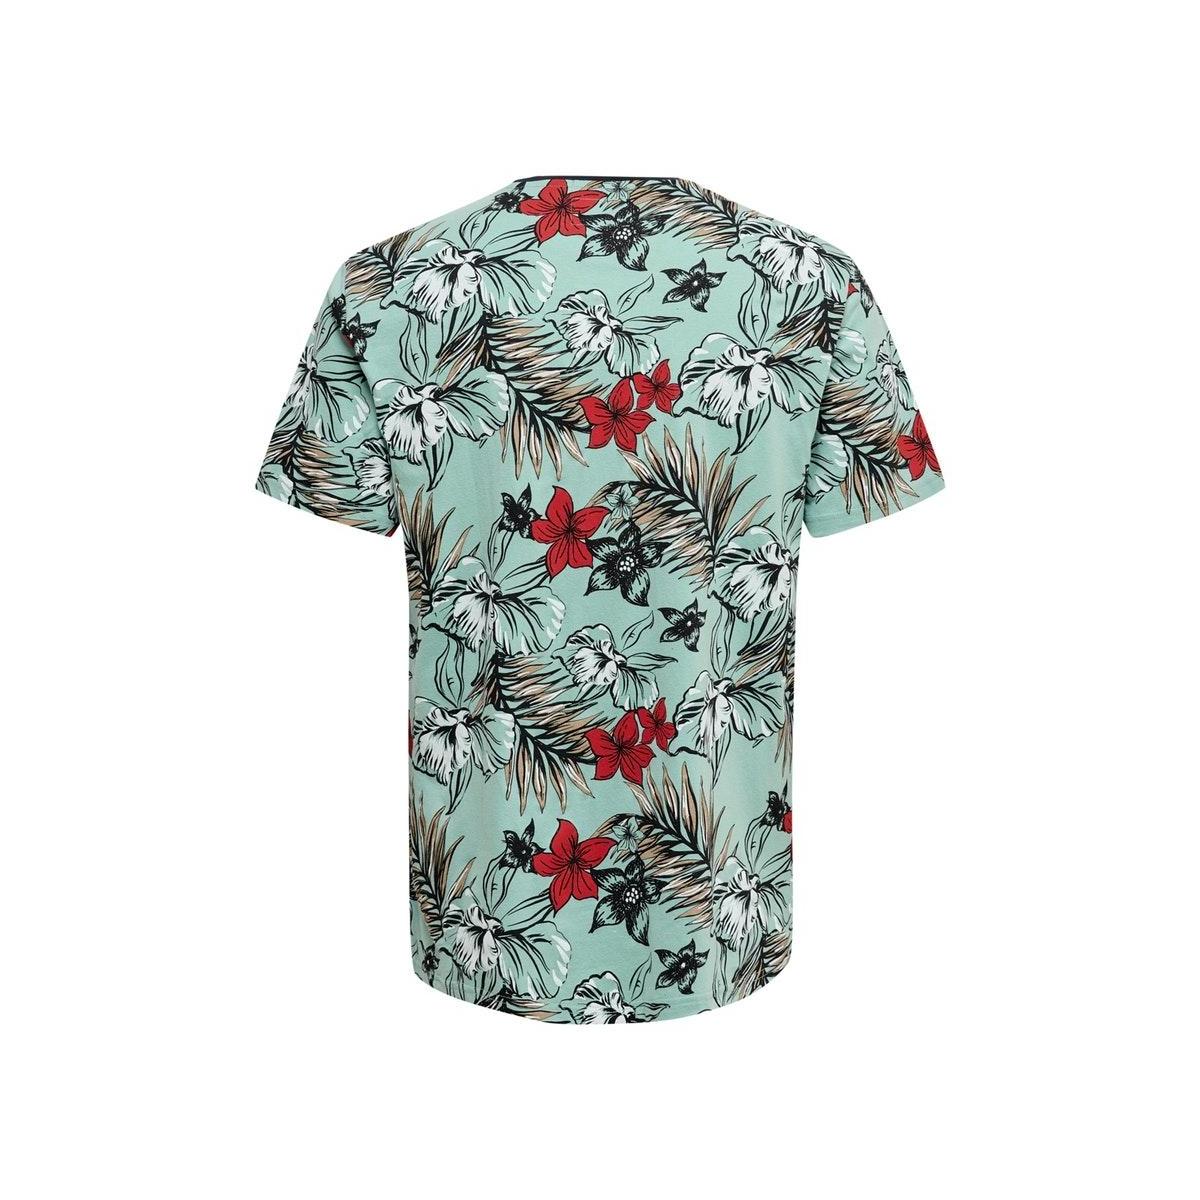 onskafka slim ss aop tee 22016074 only & sons t-shirt aquifer